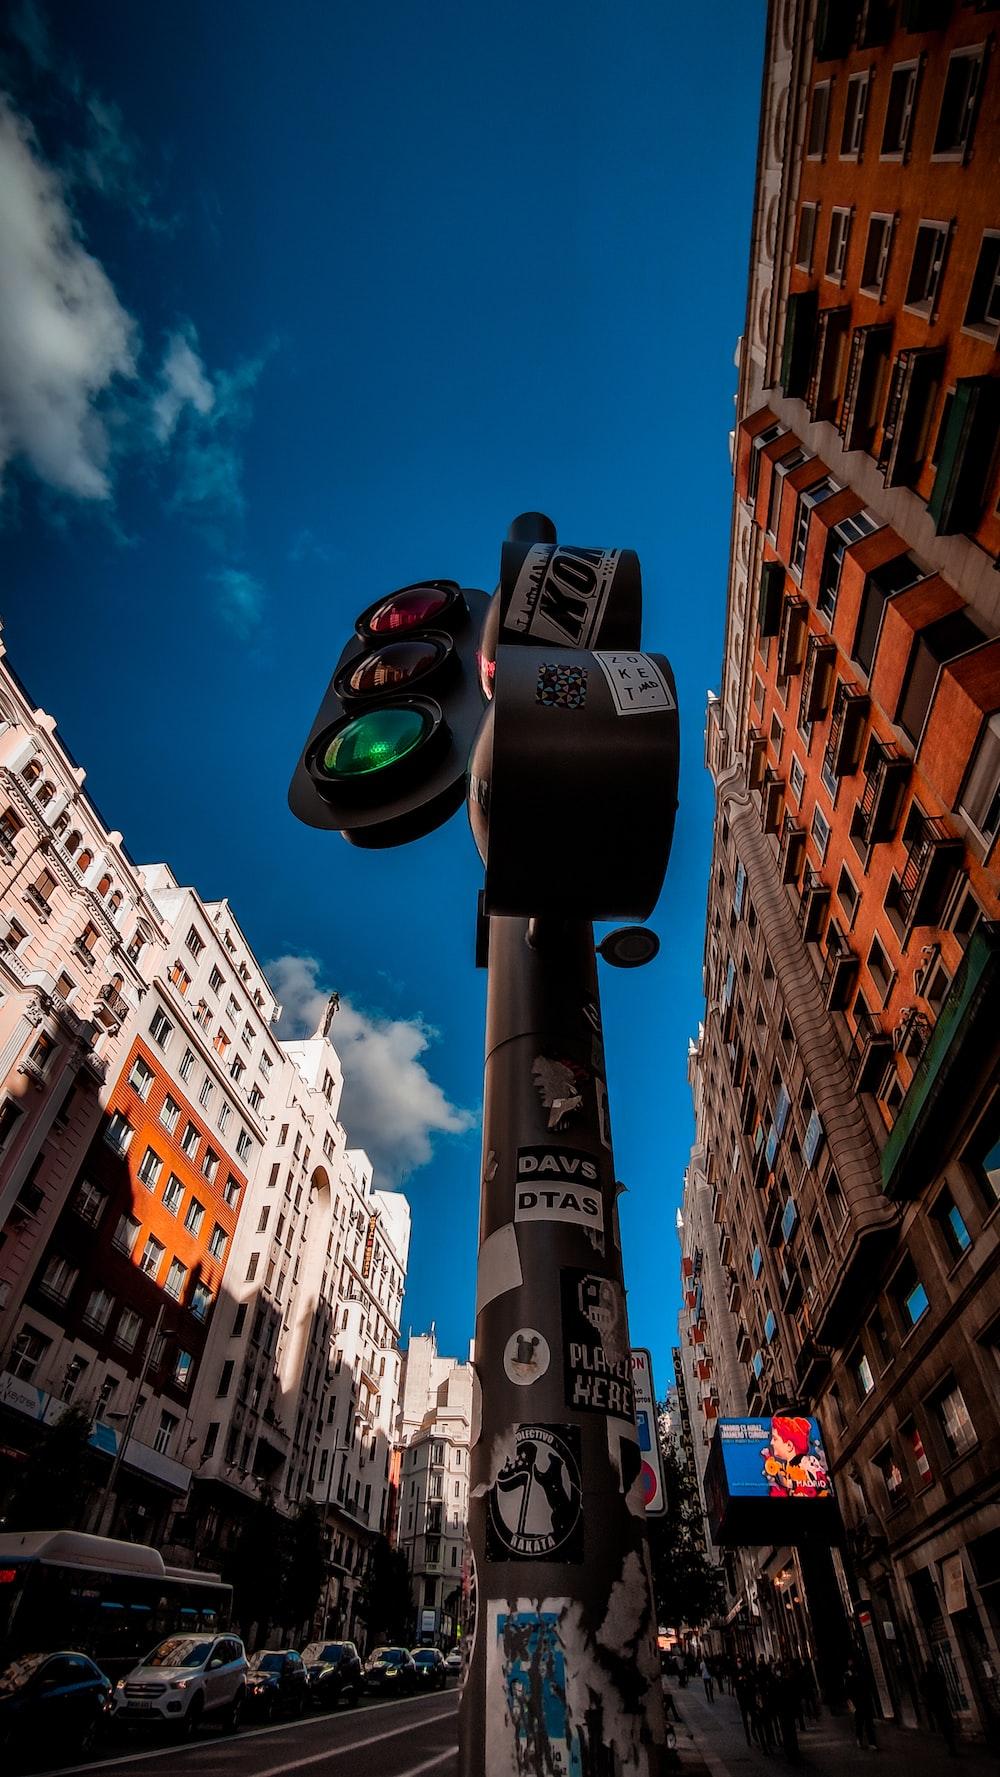 black and green street light